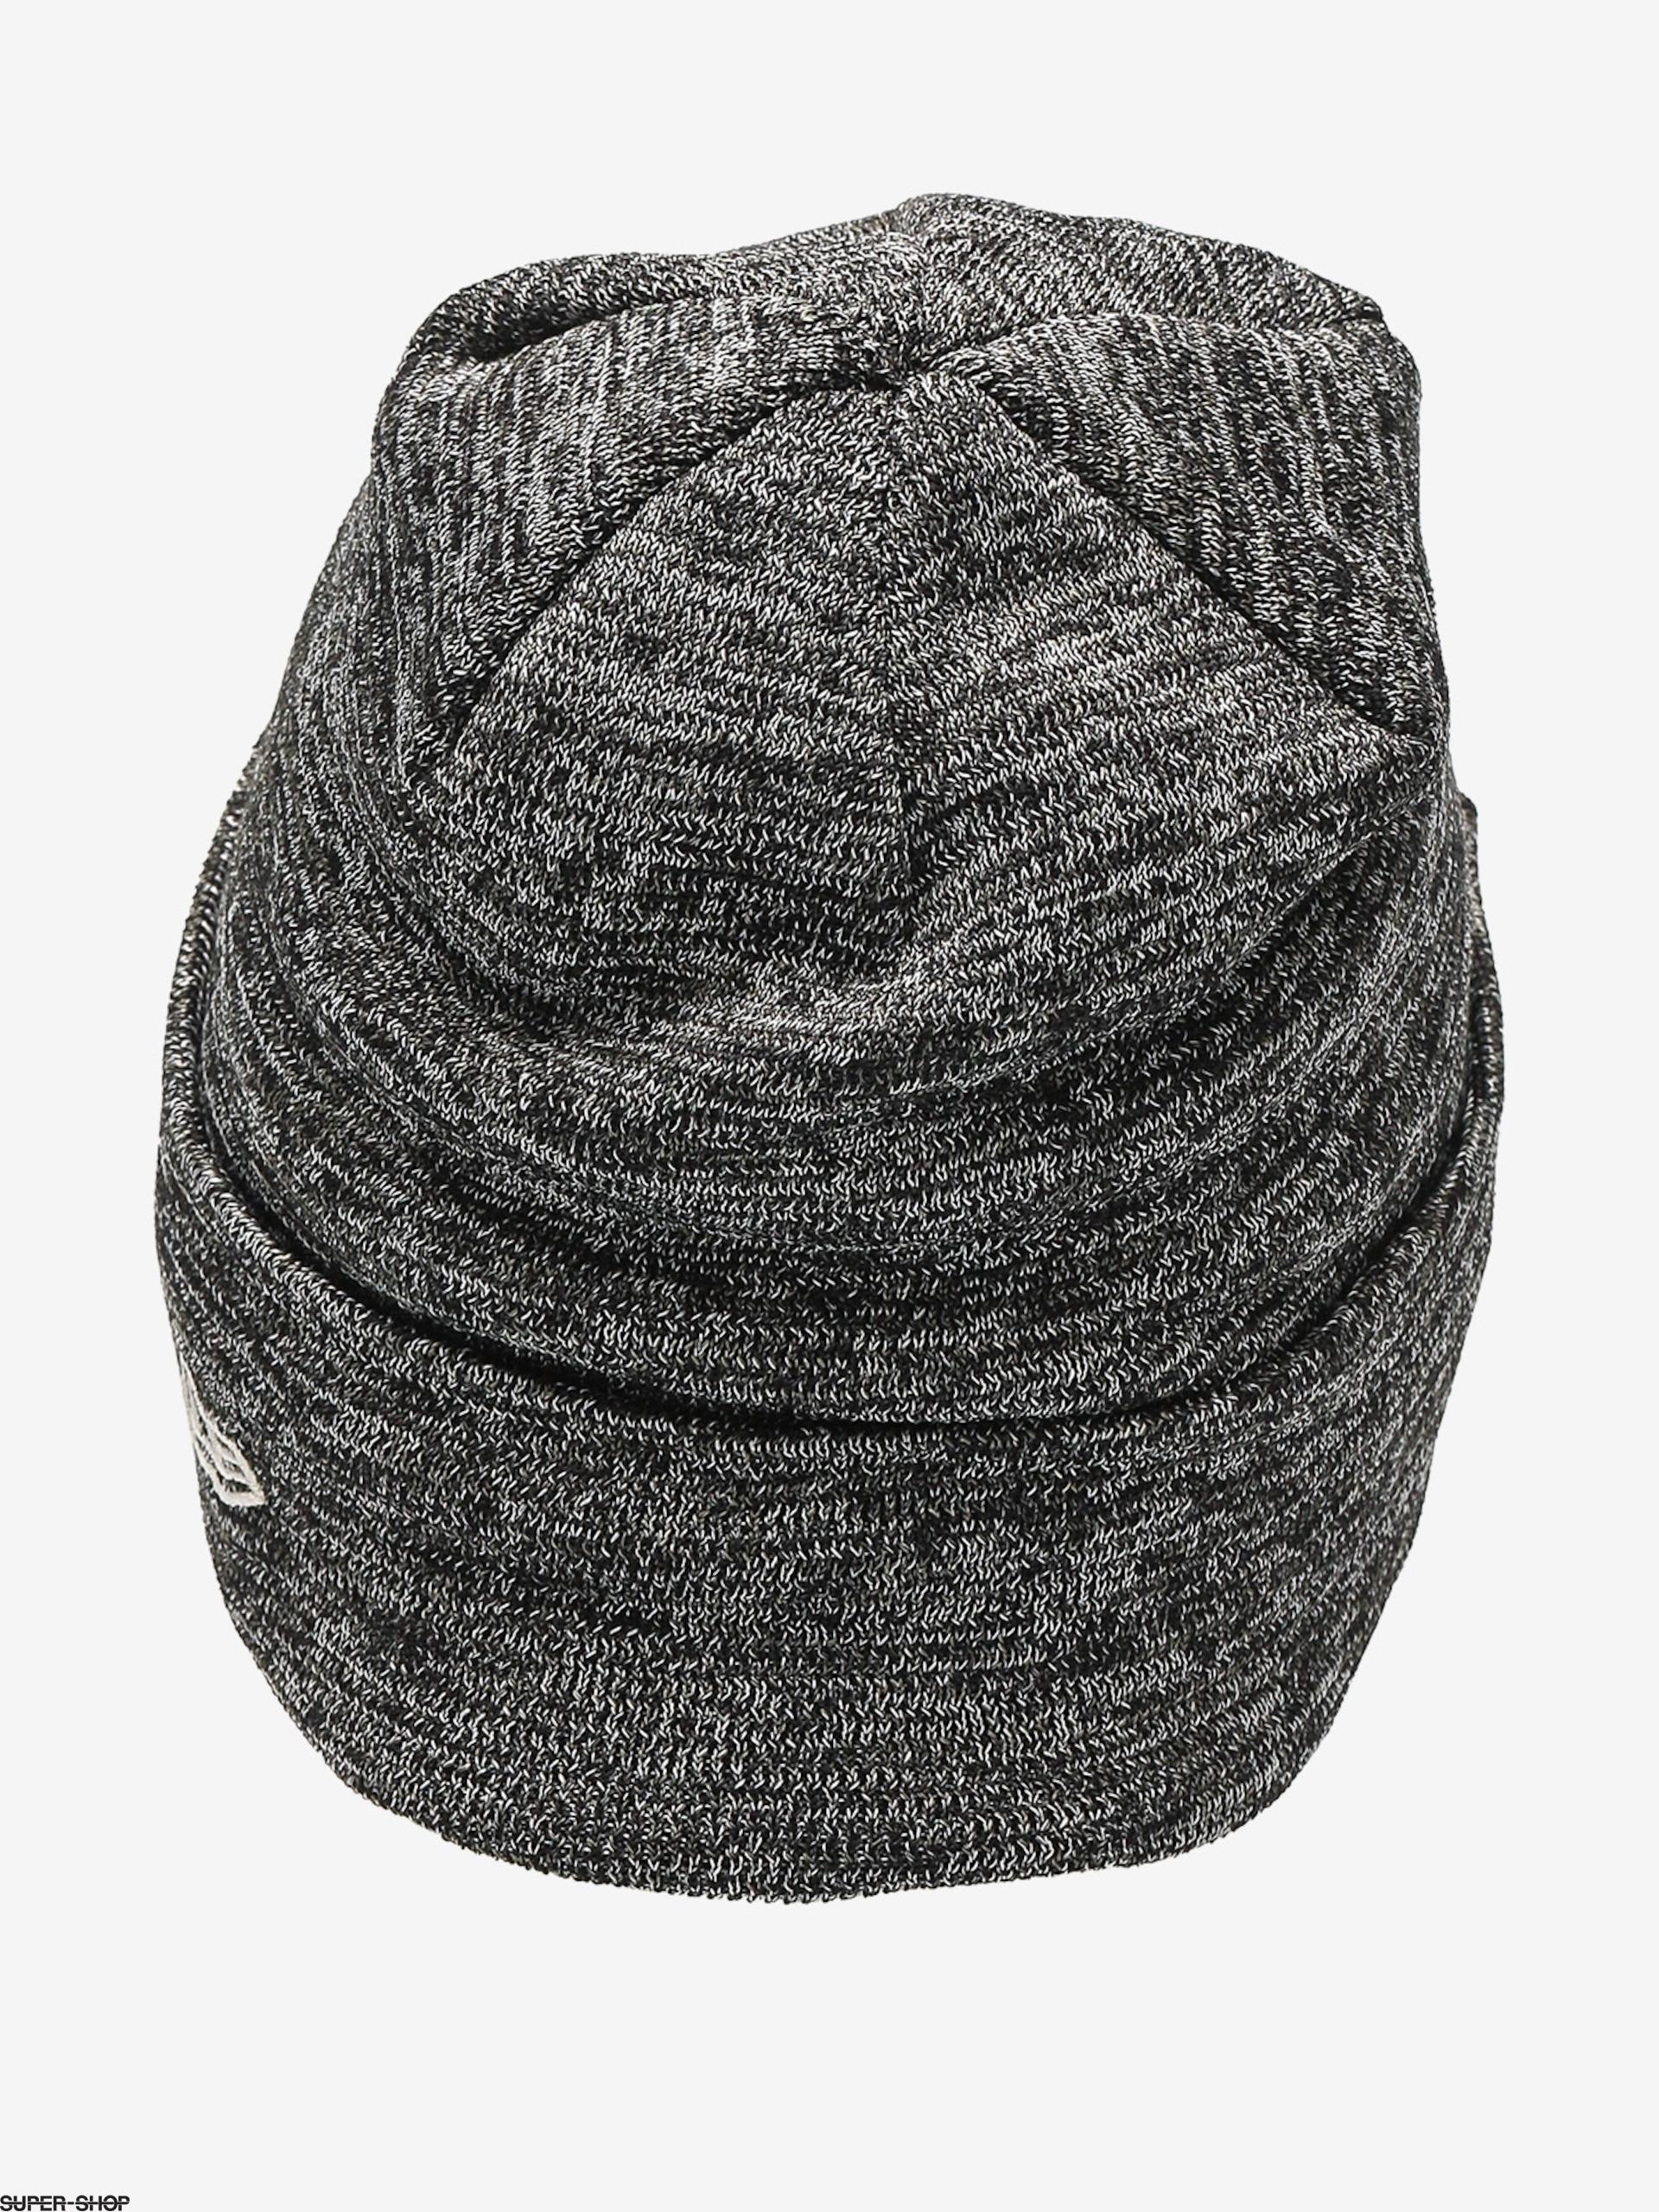 1b99c311825 New Era Engineered Fit Cuff Knit Beanie (new york yankees blknovsfp)